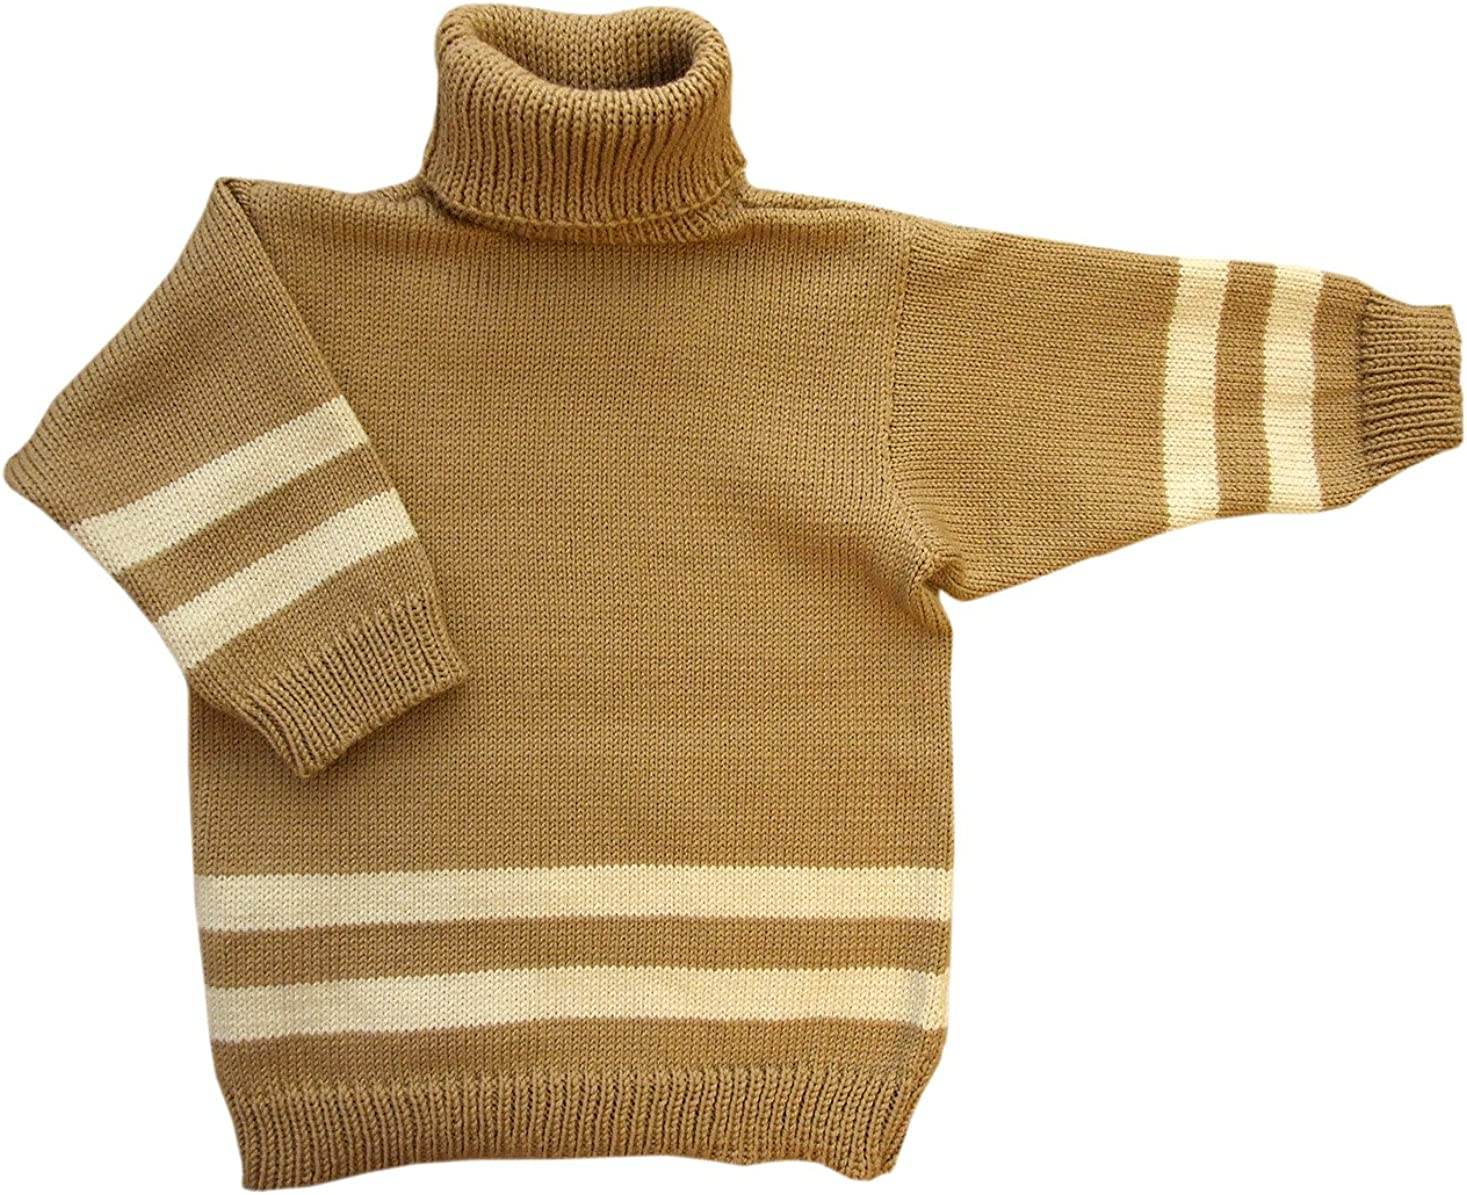 Merino Wool Knitted Polo Neck Sweater Turtleneck